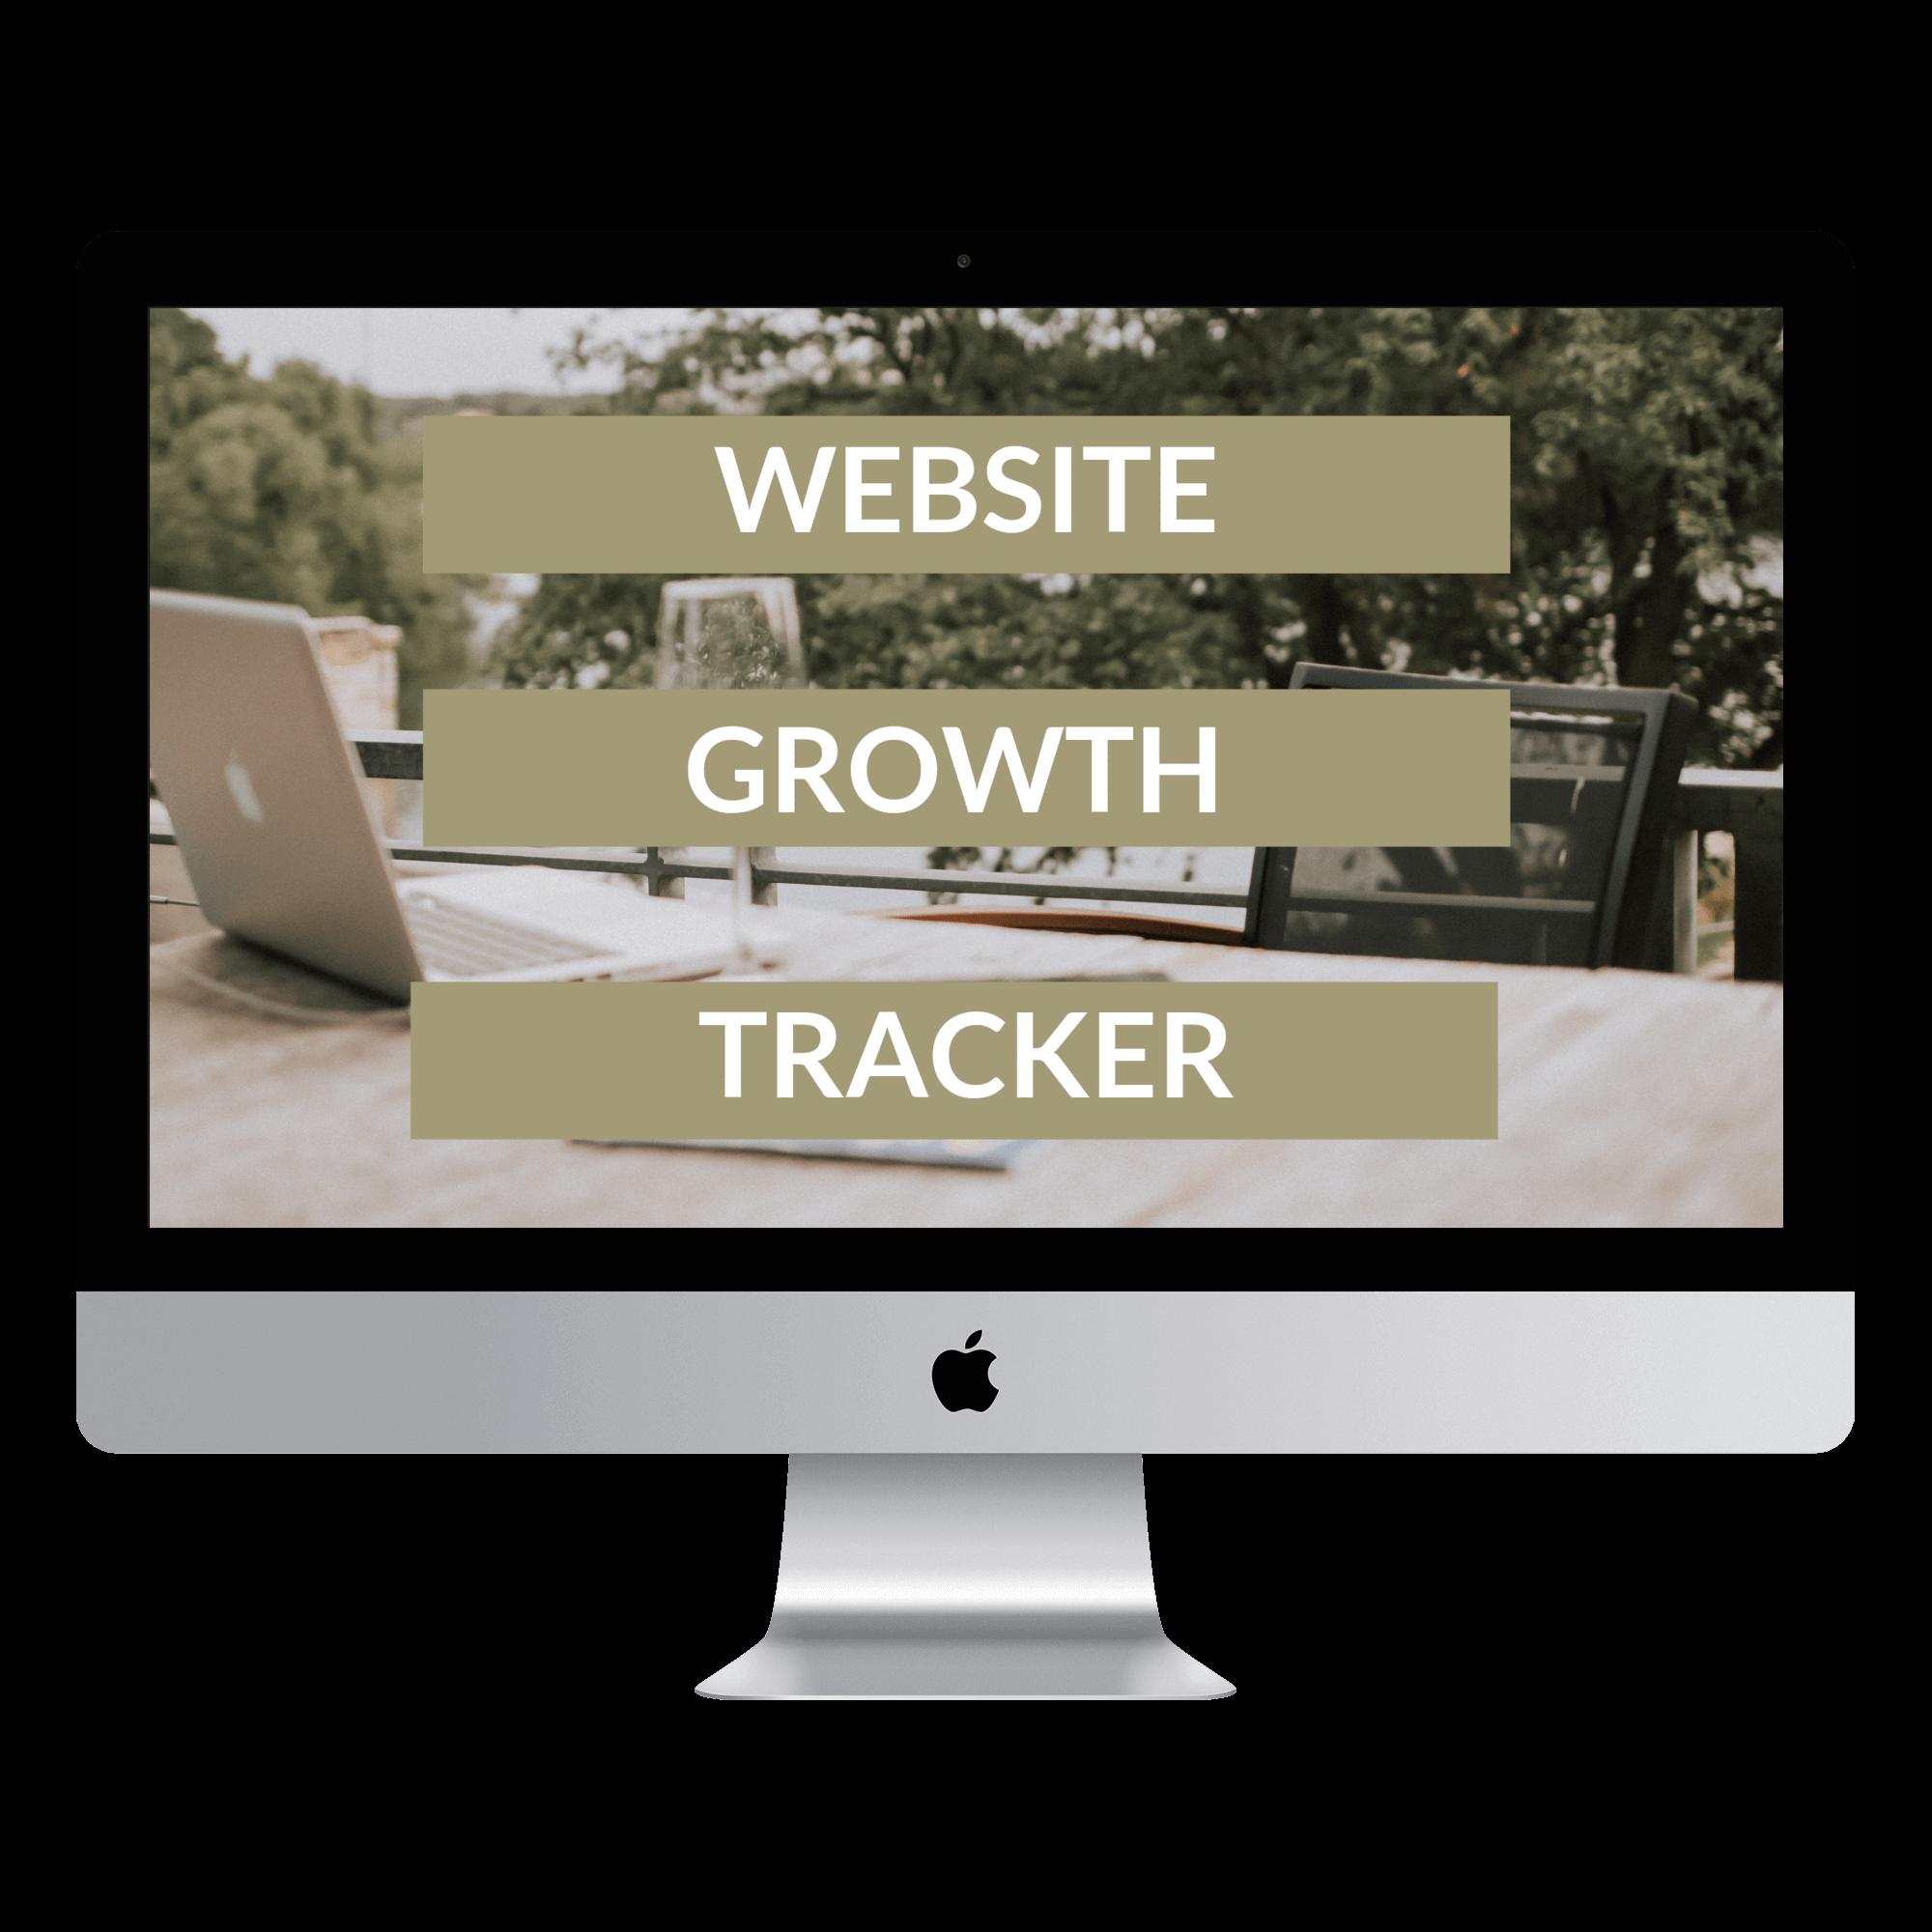 Website Growth Tracker 2019